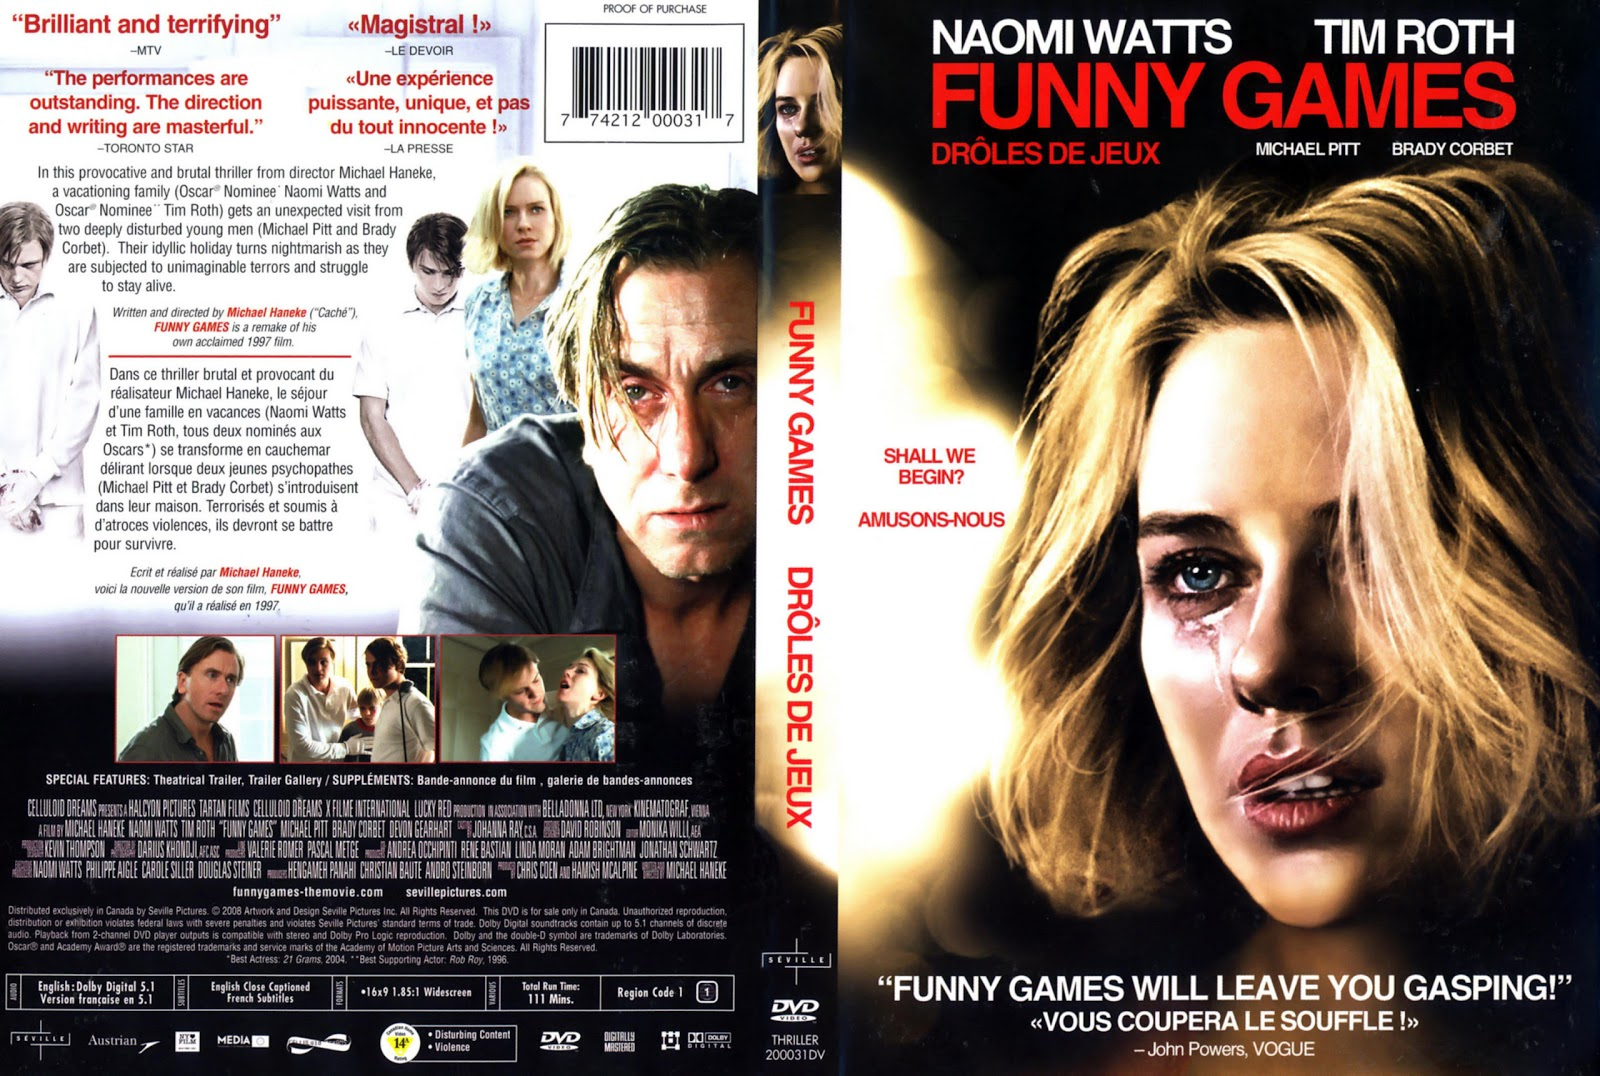 mahameru6992: Funny Games | 2007 Funny Games 2007